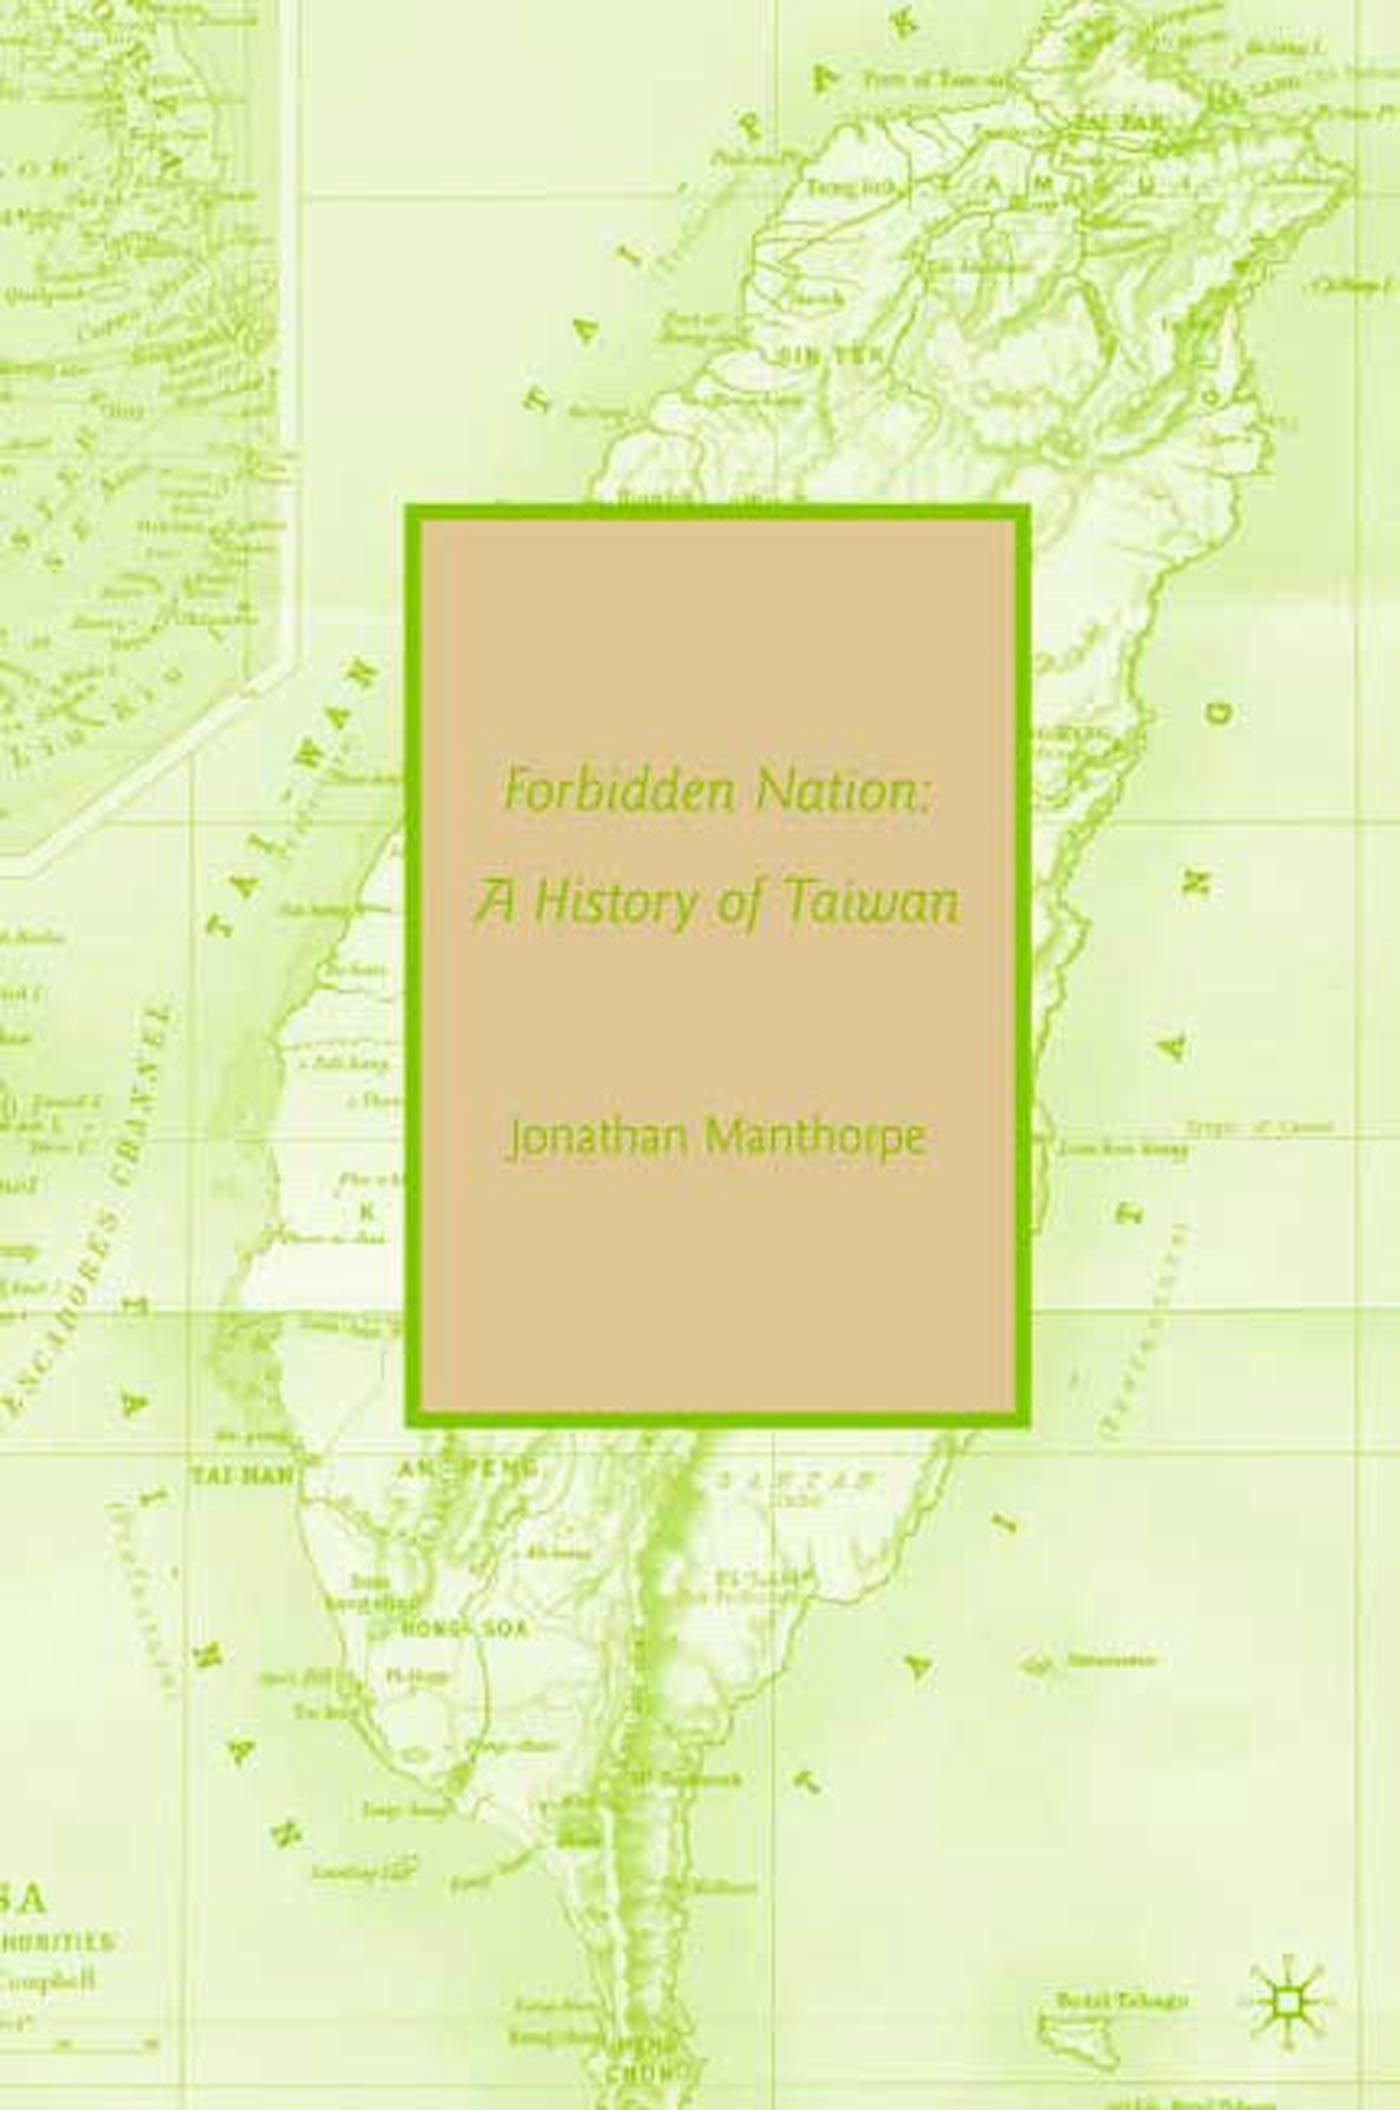 Forbidden Nation: A History of Taiwan: Amazon.co.uk: Jonathan Manthorpe:  9780230614246: Books